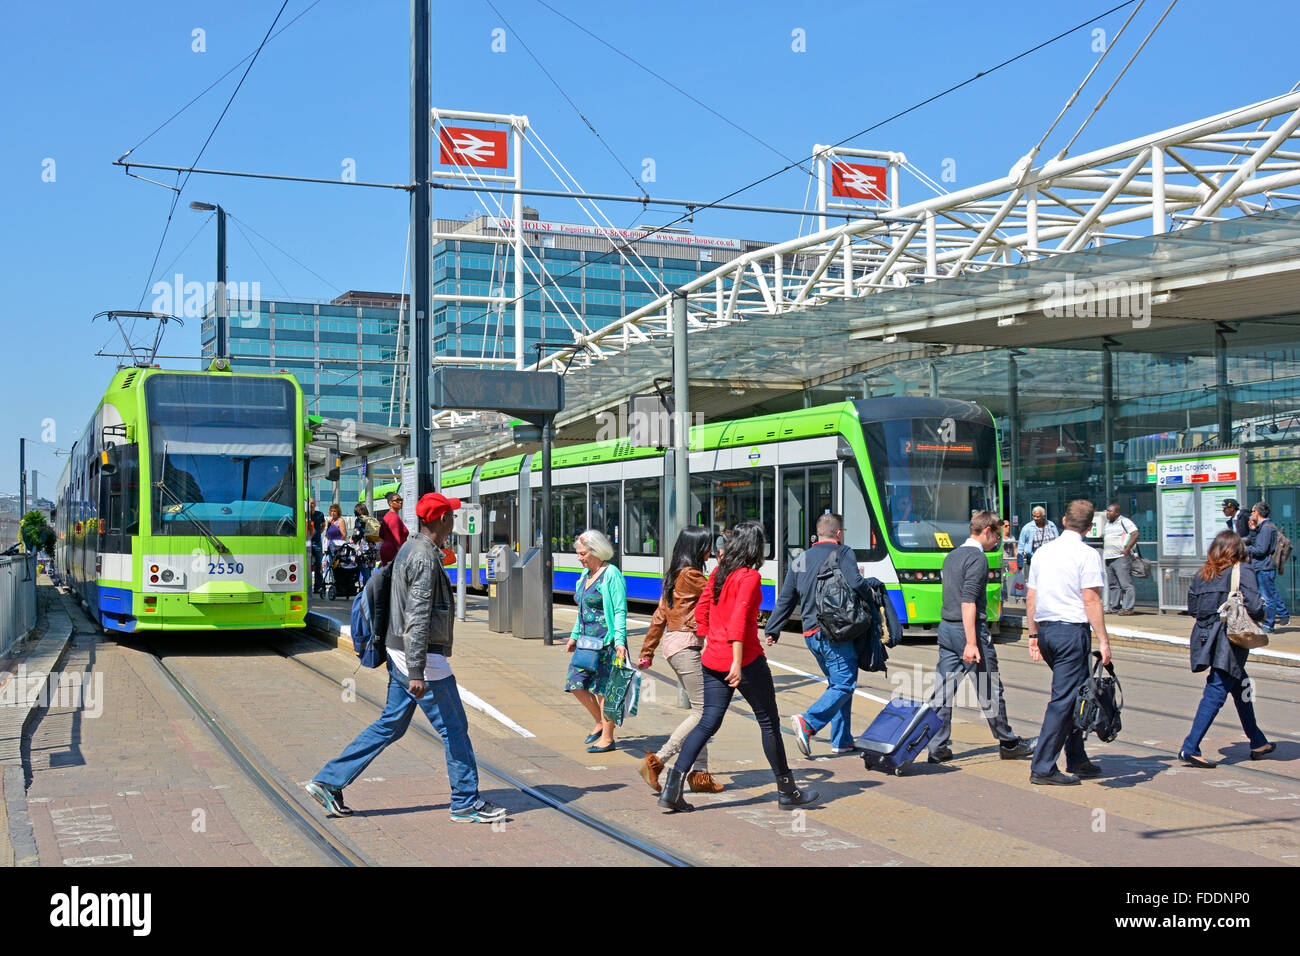 People on pedestrian crossing tram tracks outside East Croydon train station public transport tramlink services - Stock Image